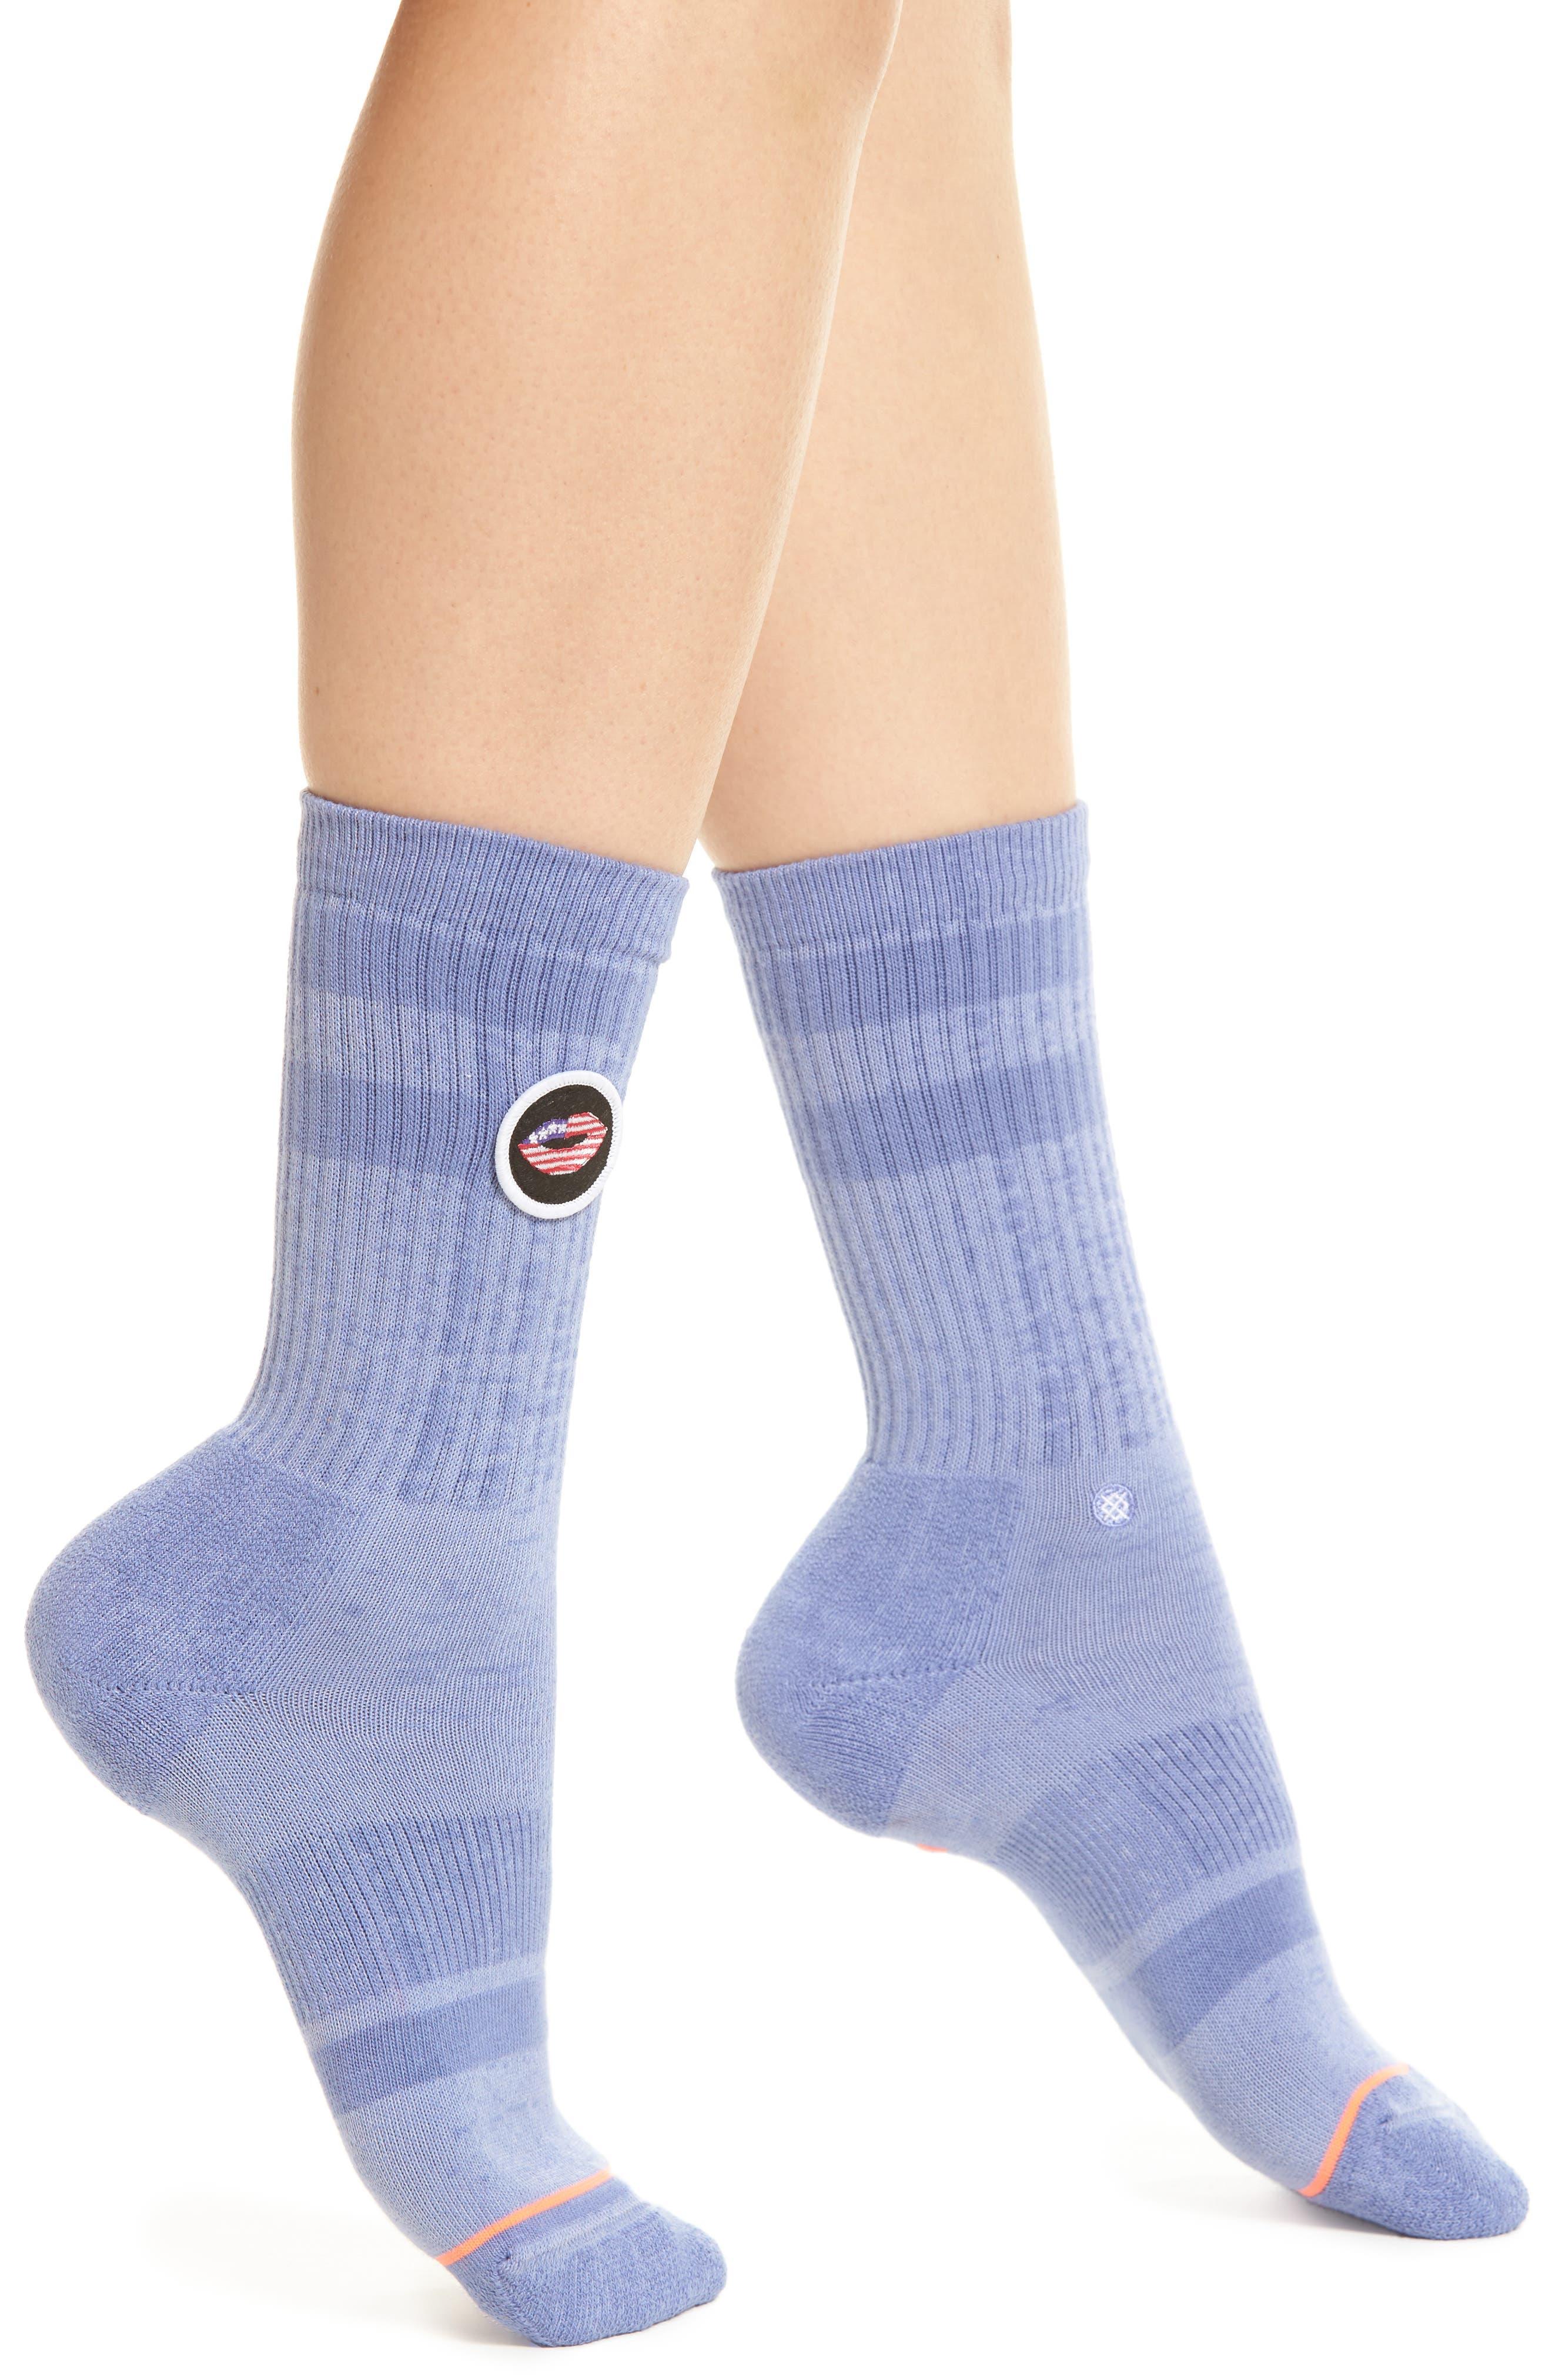 Alternate Image 1 Selected - Stance Kiss My Flag Crew Socks